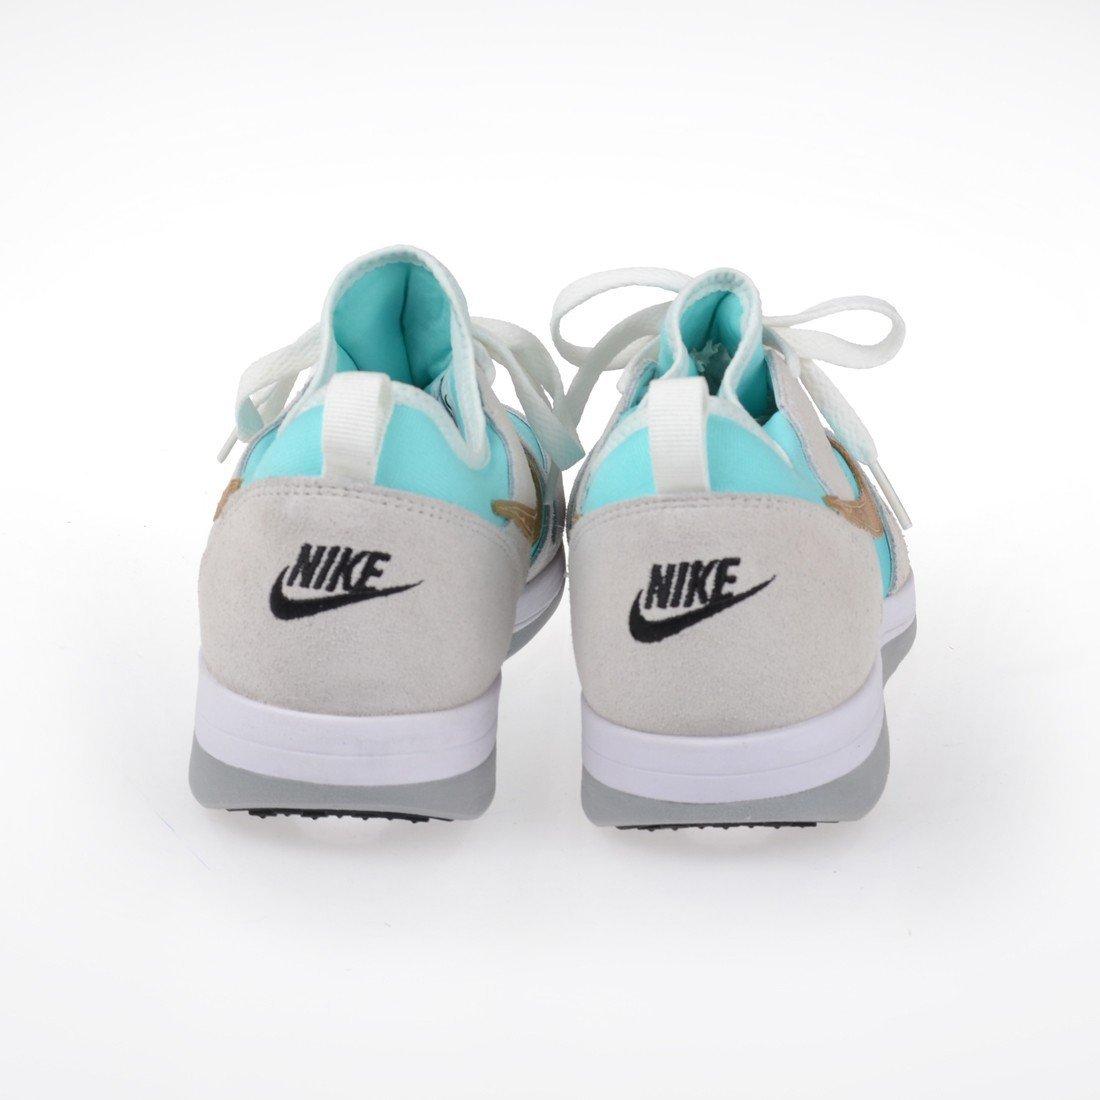 new concept 191ff b8189 Nike Archive '75 - Light Aqua / Summit White / White / Metallic Gold - US  9.5 / EU 43.0: Amazon.es: Zapatos y complementos